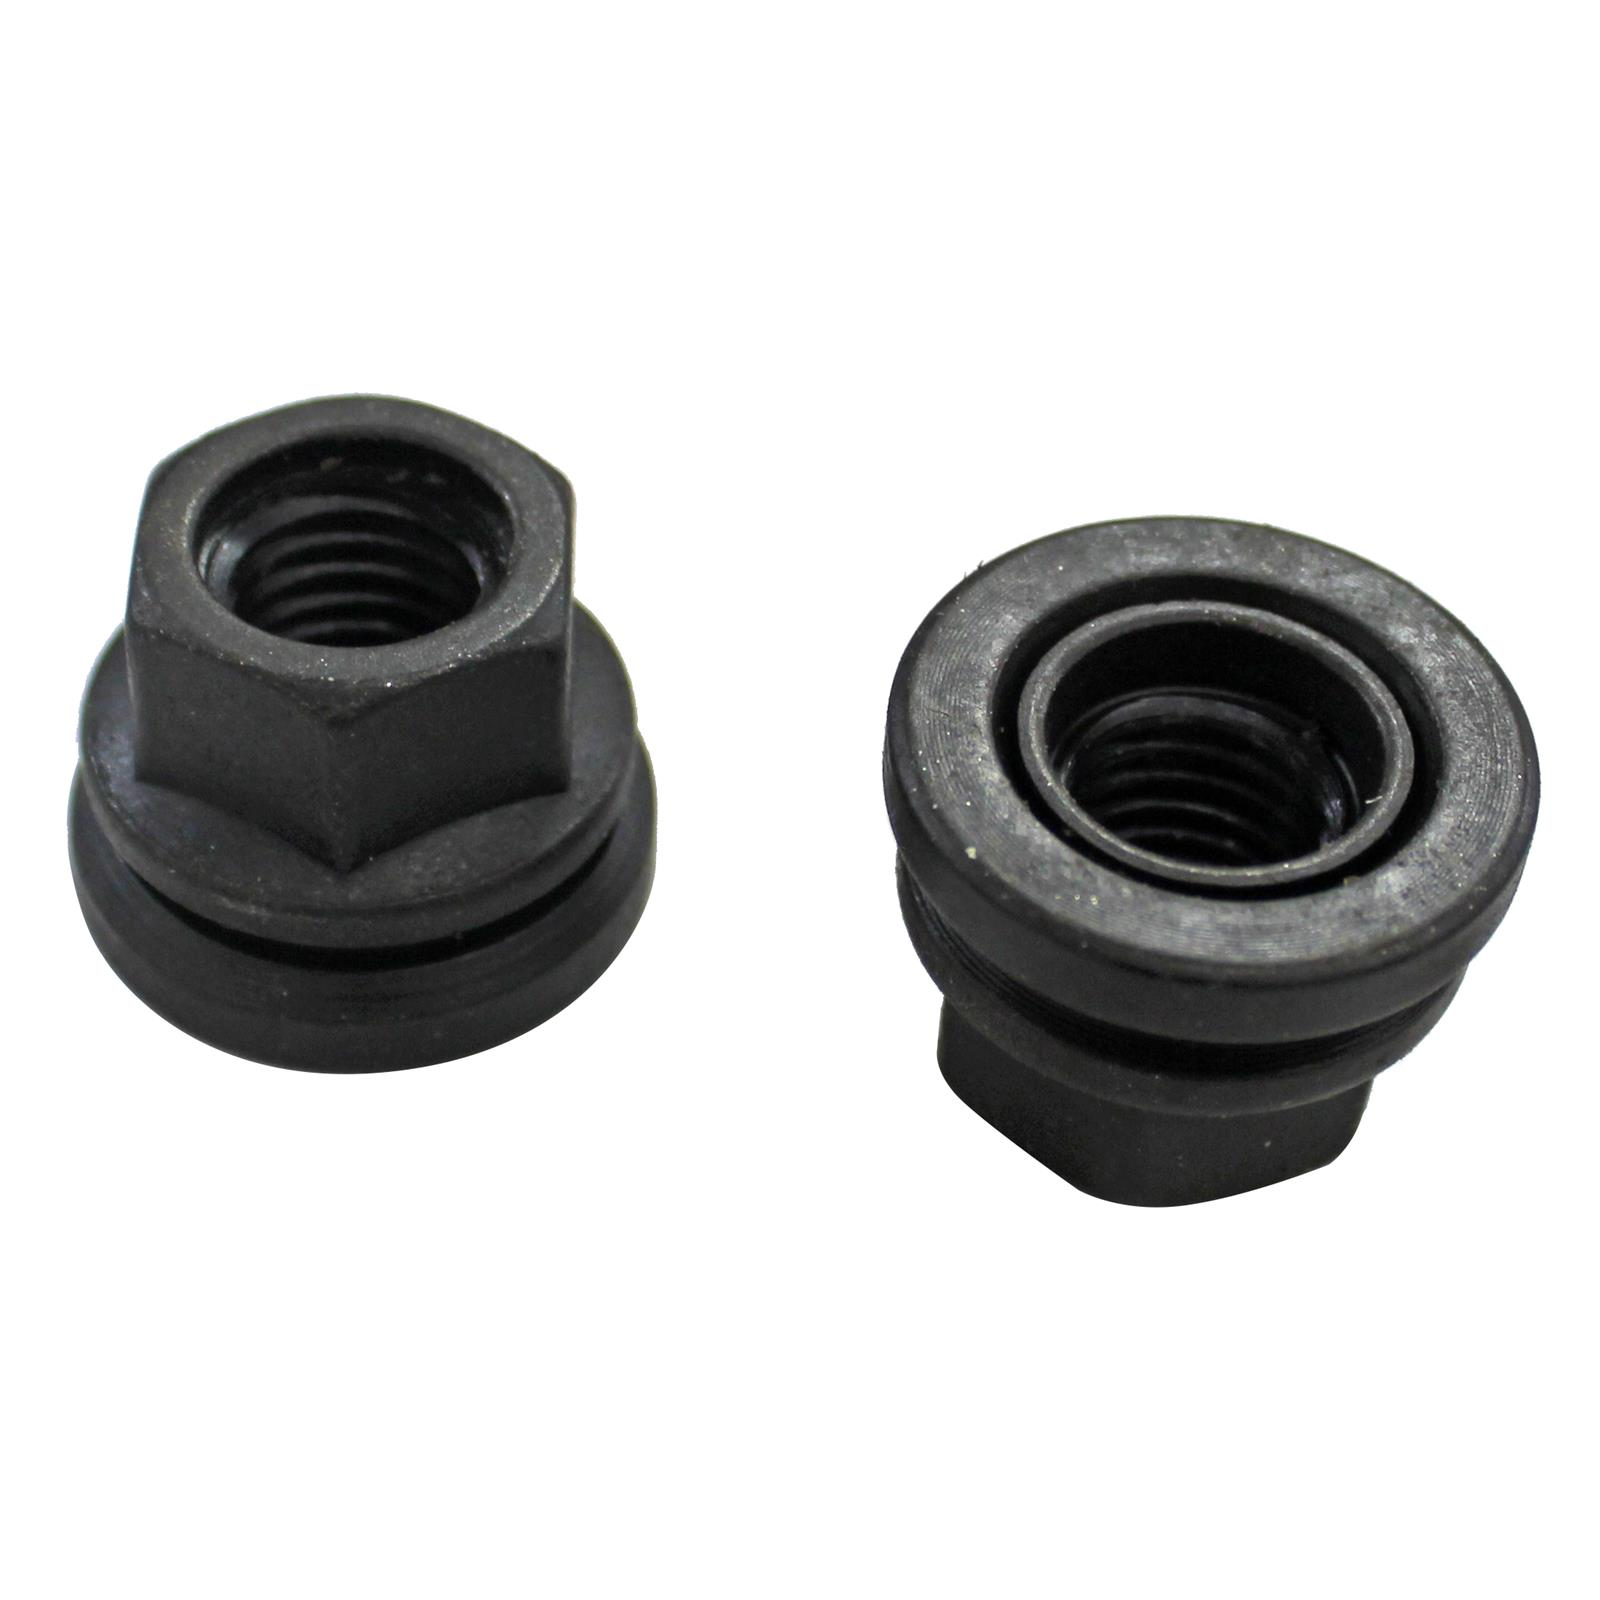 SOLD AS EACH Dorman 611-202 Wheel Lug Nut